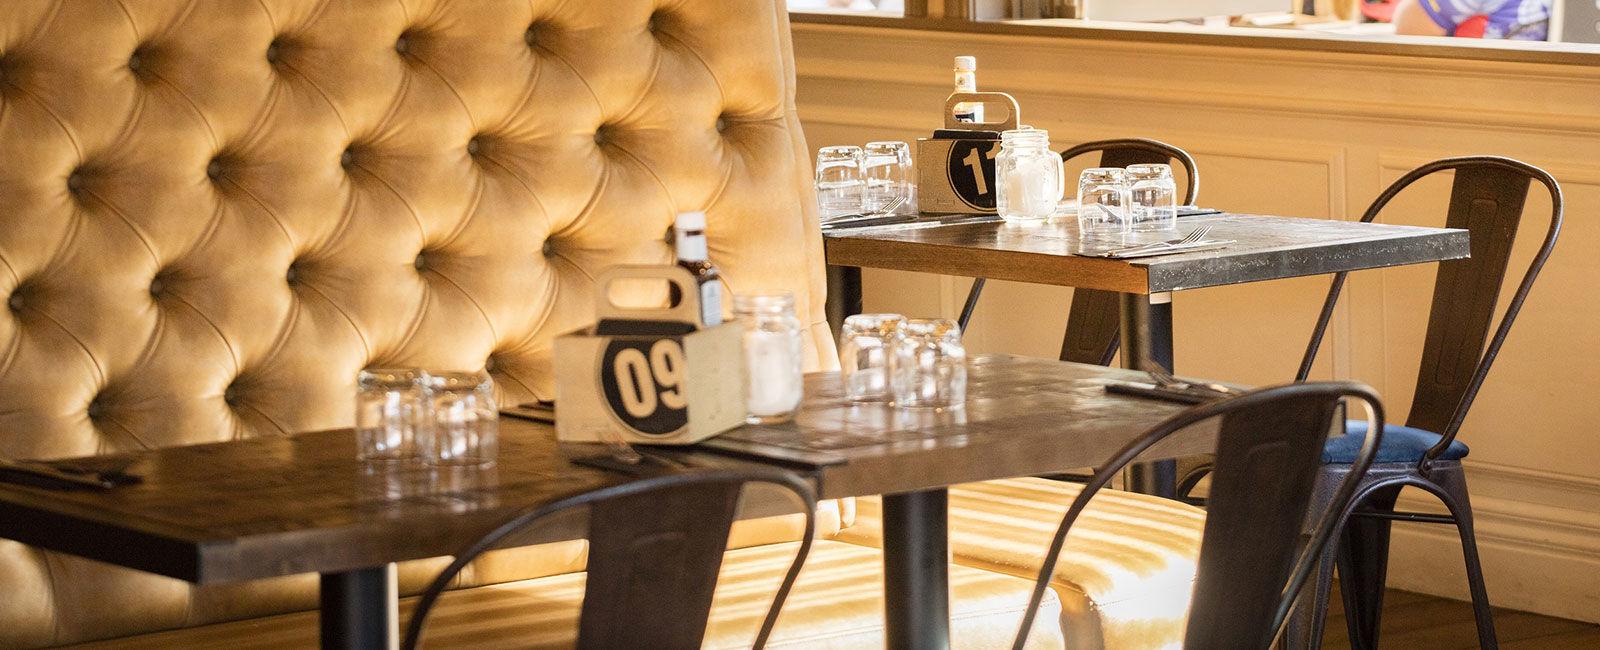 Fire Ice Cafe Restaurant Bar Furniture